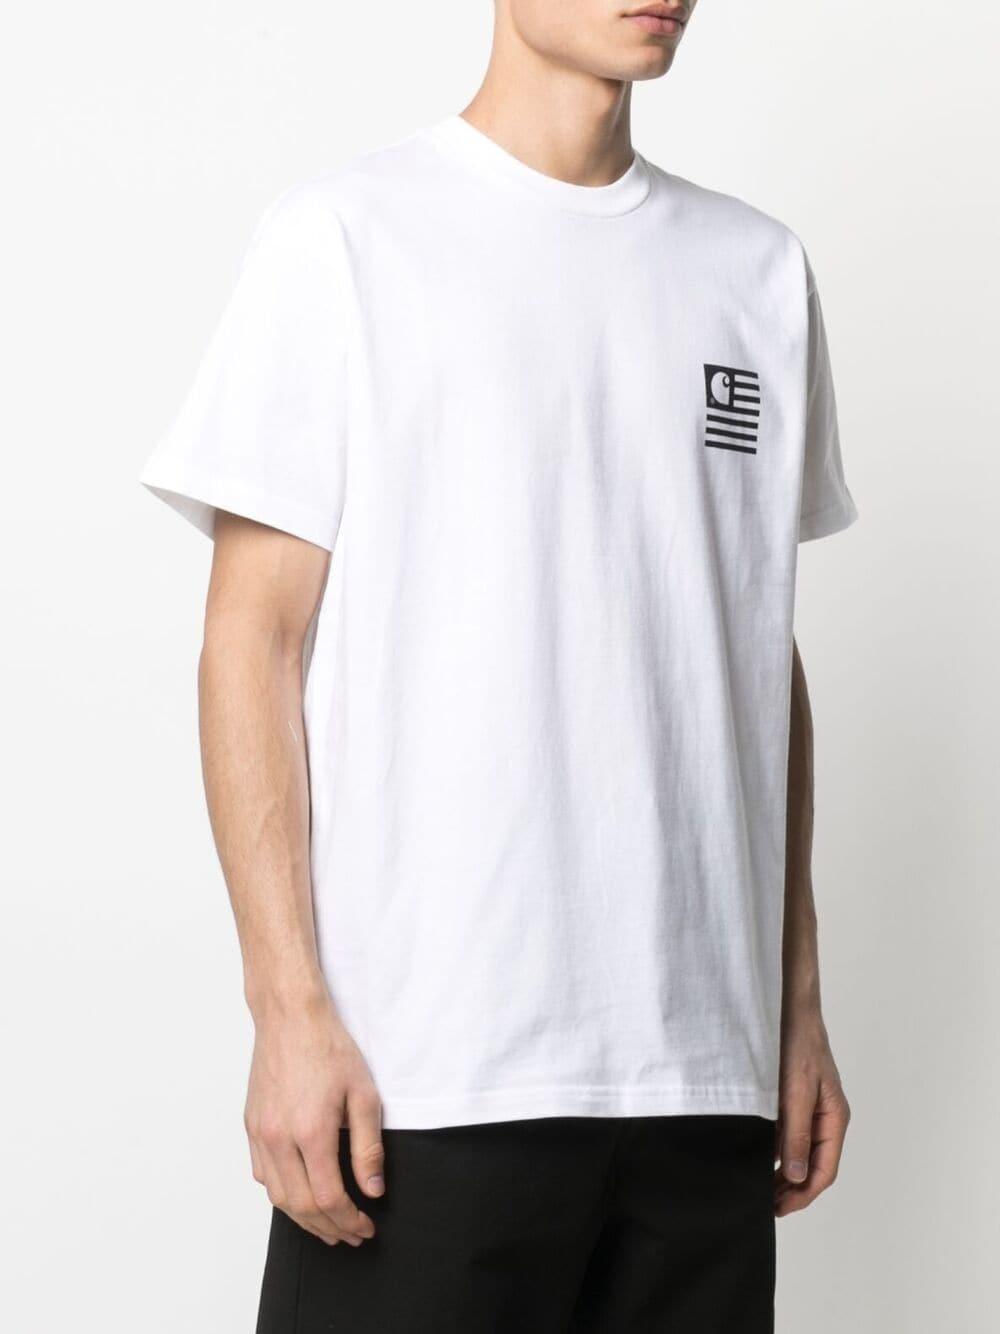 WAVY STATE T-SHIRT CARHARTT WIP | T-shirts | I02901102.90